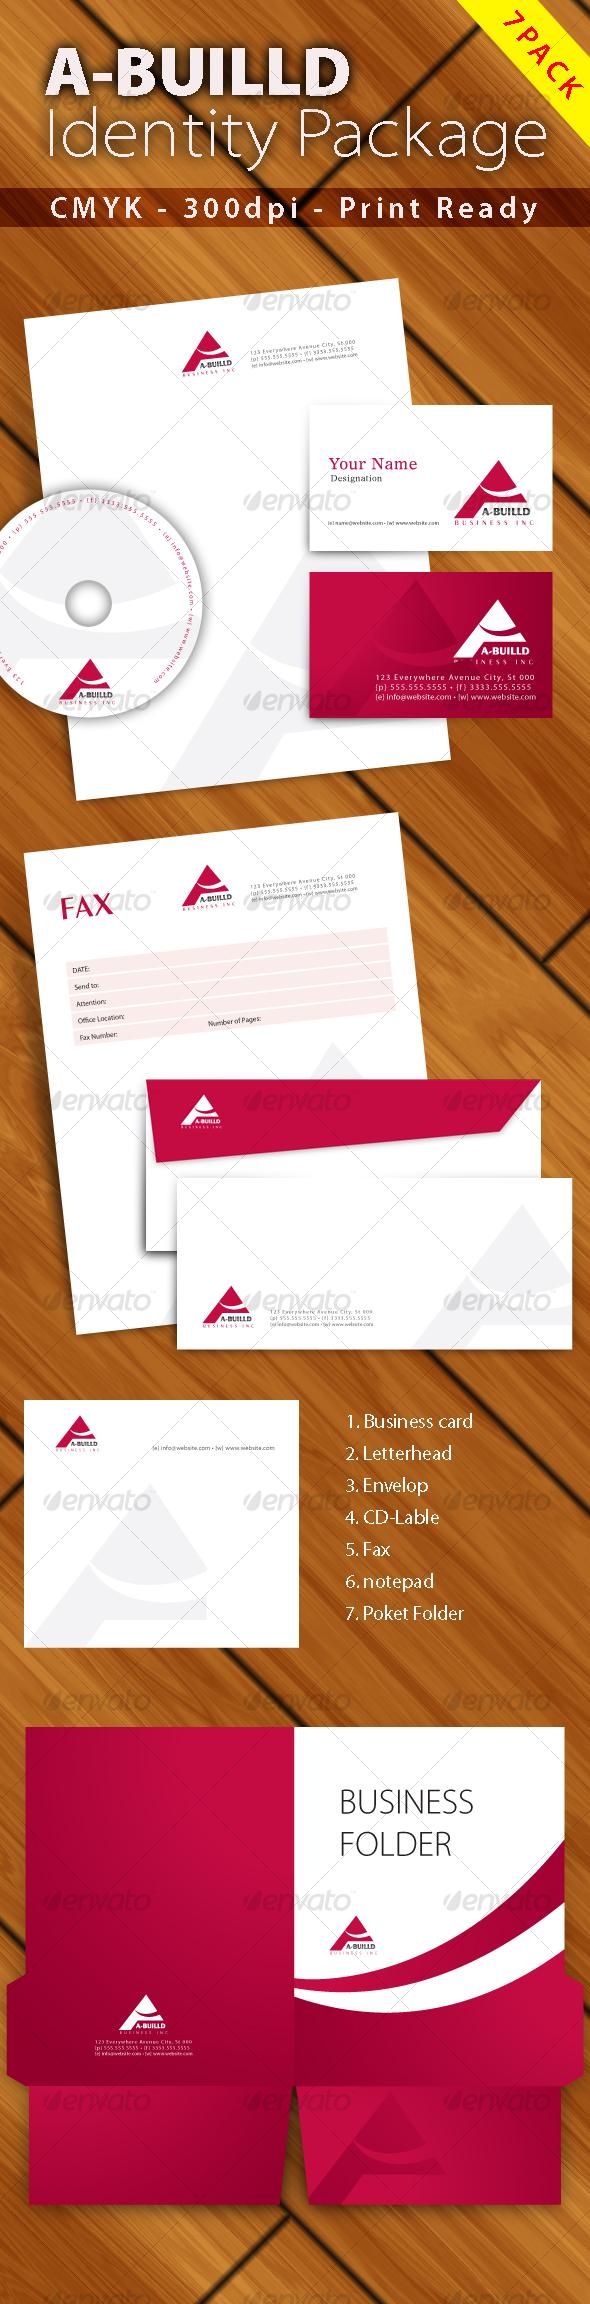 Corporate identity 7set [ Print Ready ] - Stationery Print Templates